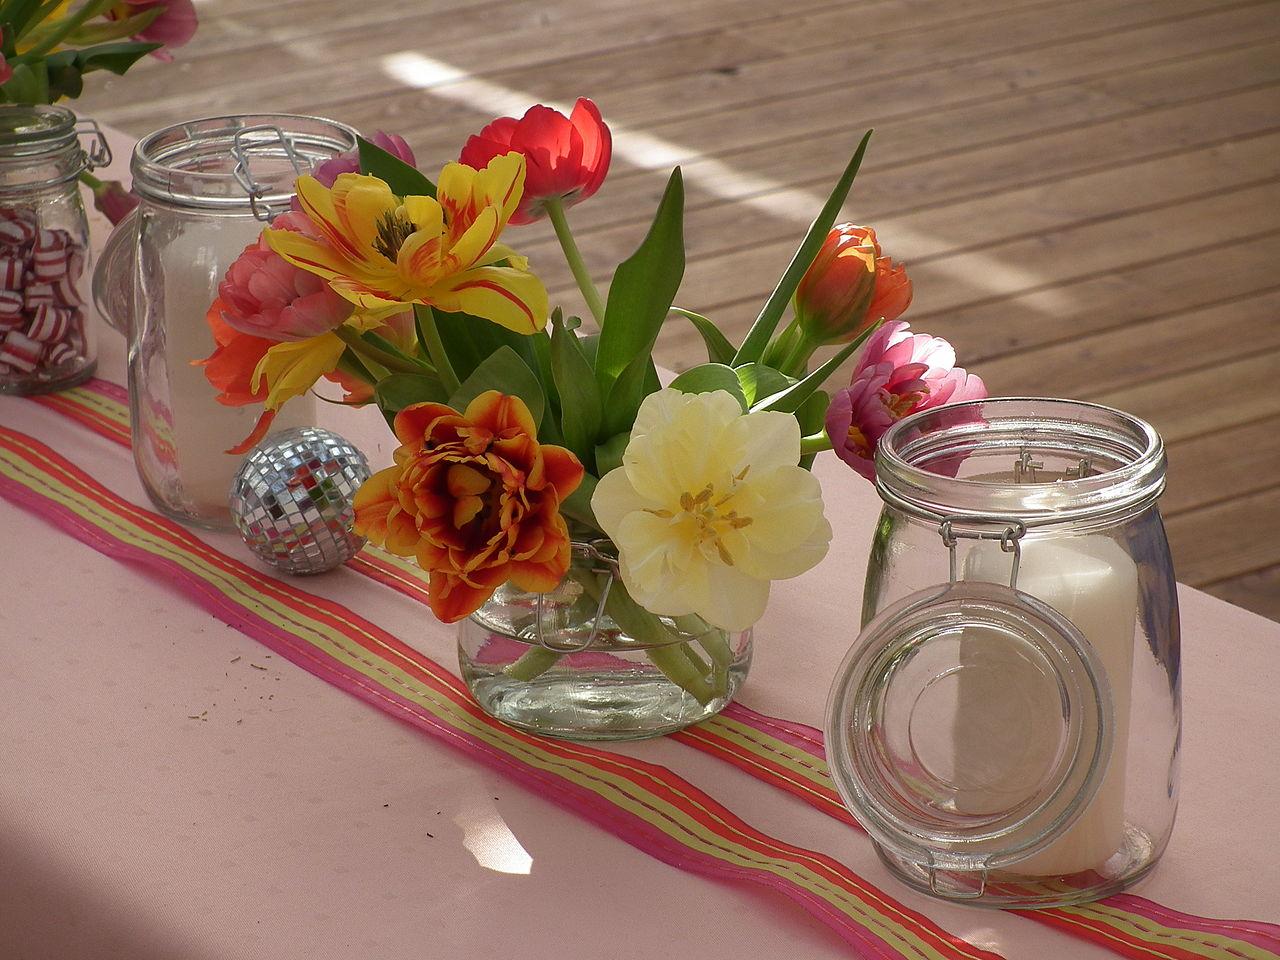 File Tischdekoration Einmachglaser Kerzen Tulpen Jpg Wikimedia Commons